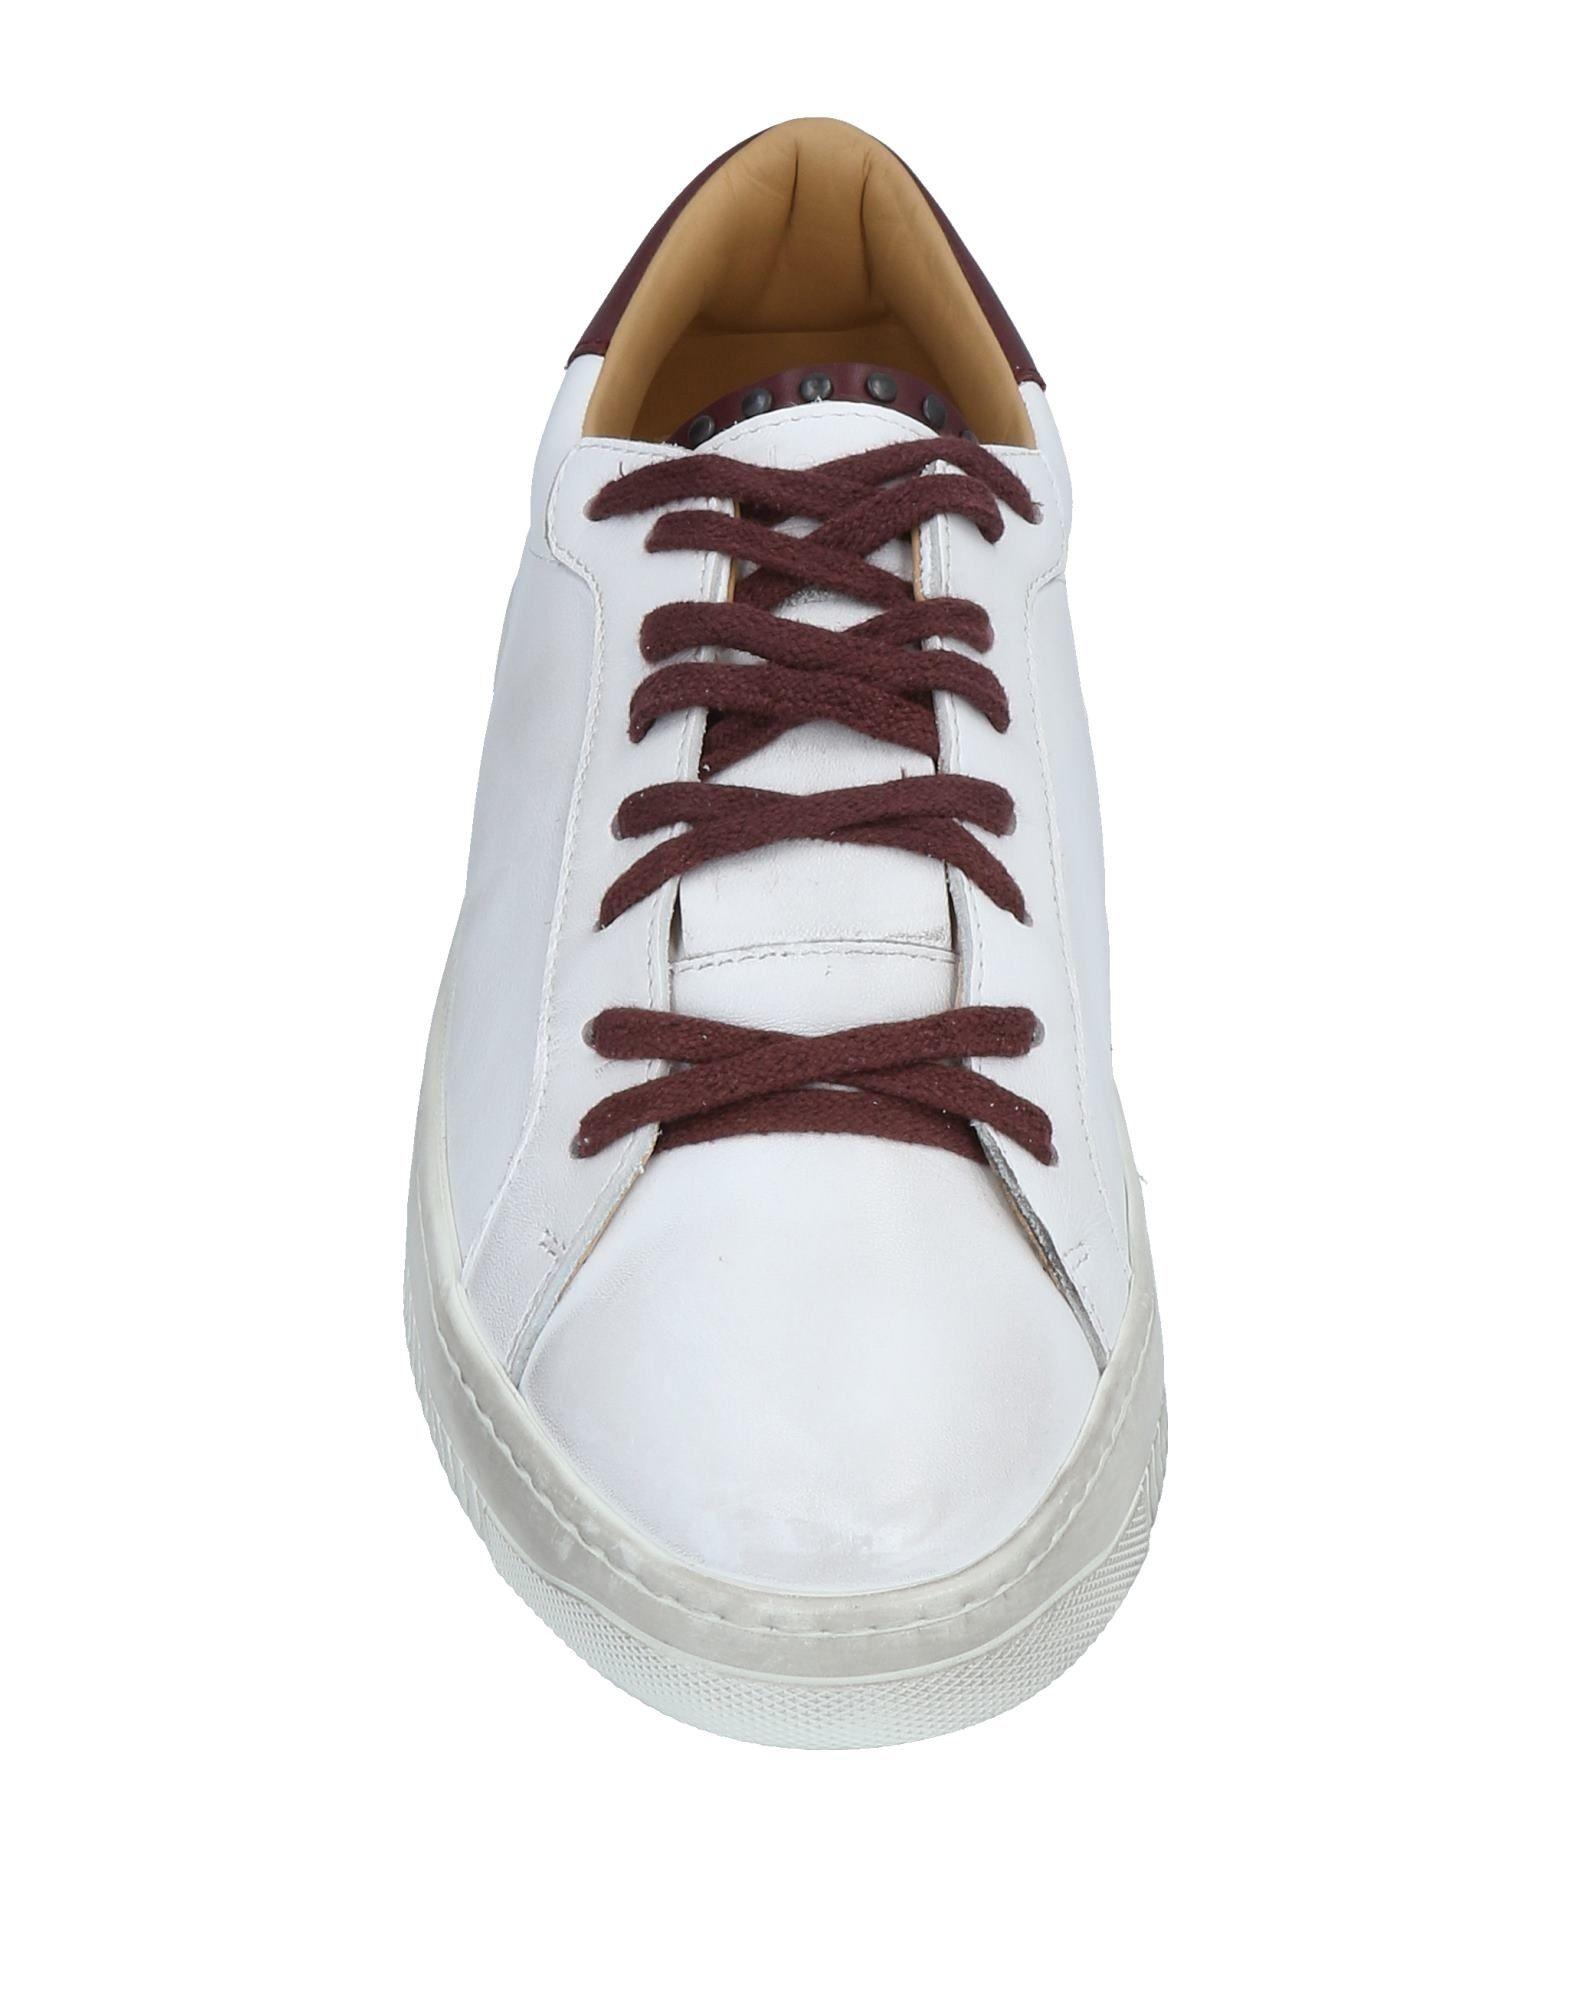 Eleventy Gute Sneakers Herren  11469166QV Gute Eleventy Qualität beliebte Schuhe 113c91